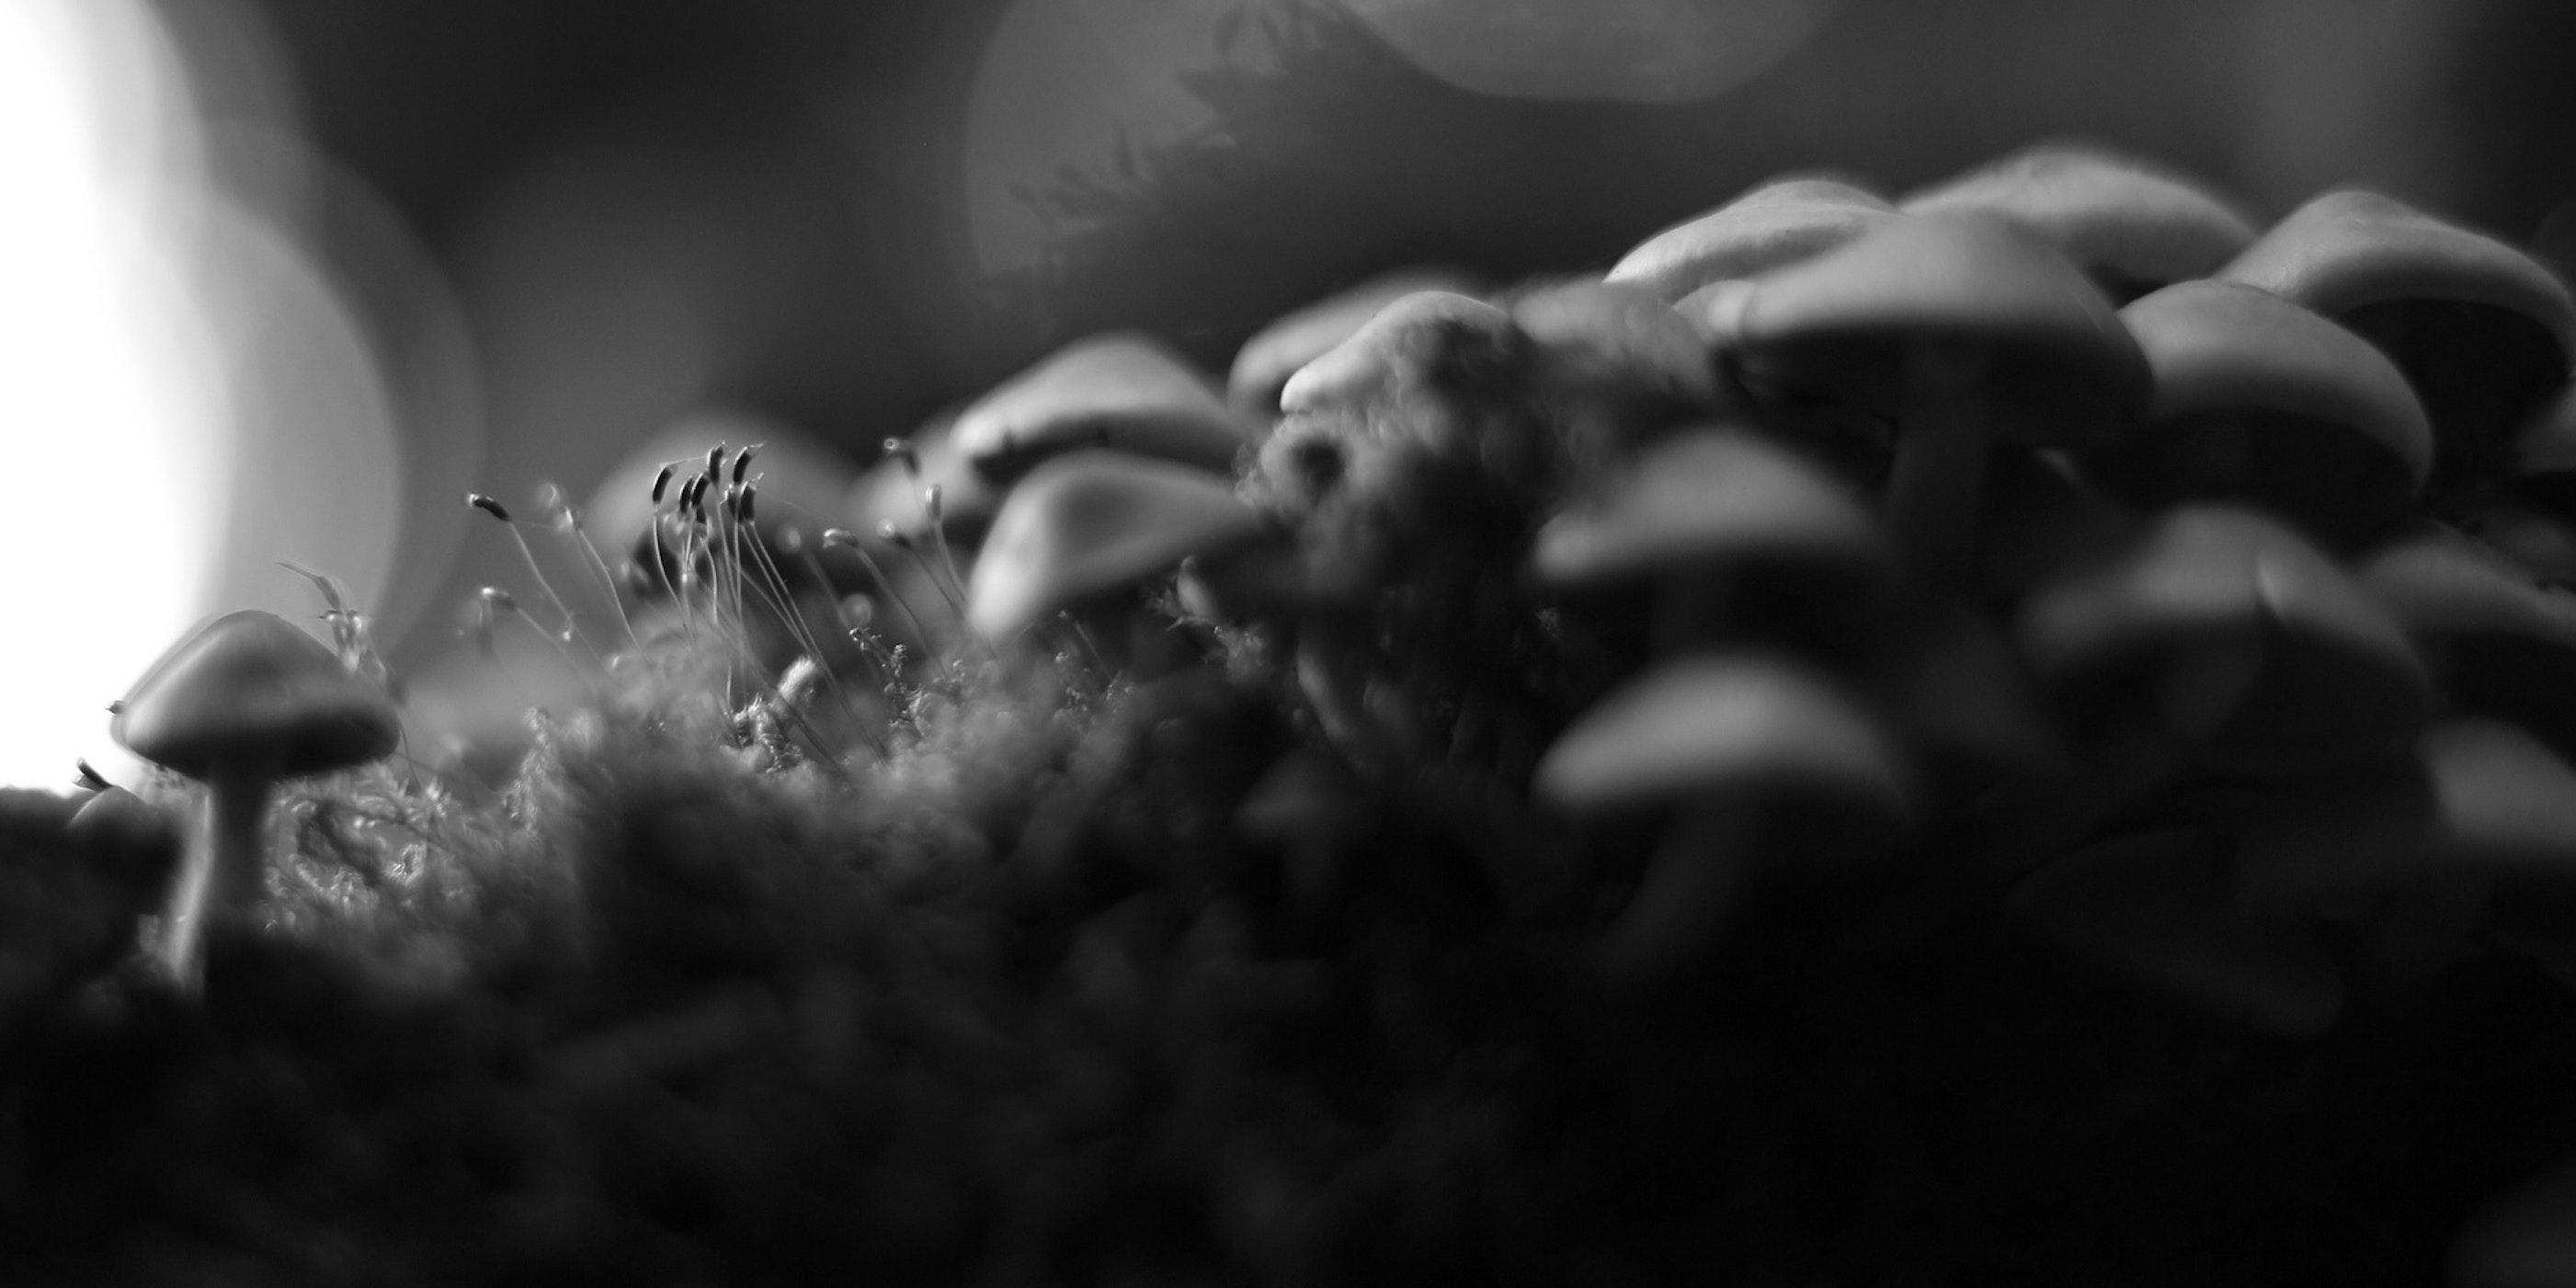 Magic Mushrooms Put the Human Brain in Dream Mode and Facilitate Higher Thinking